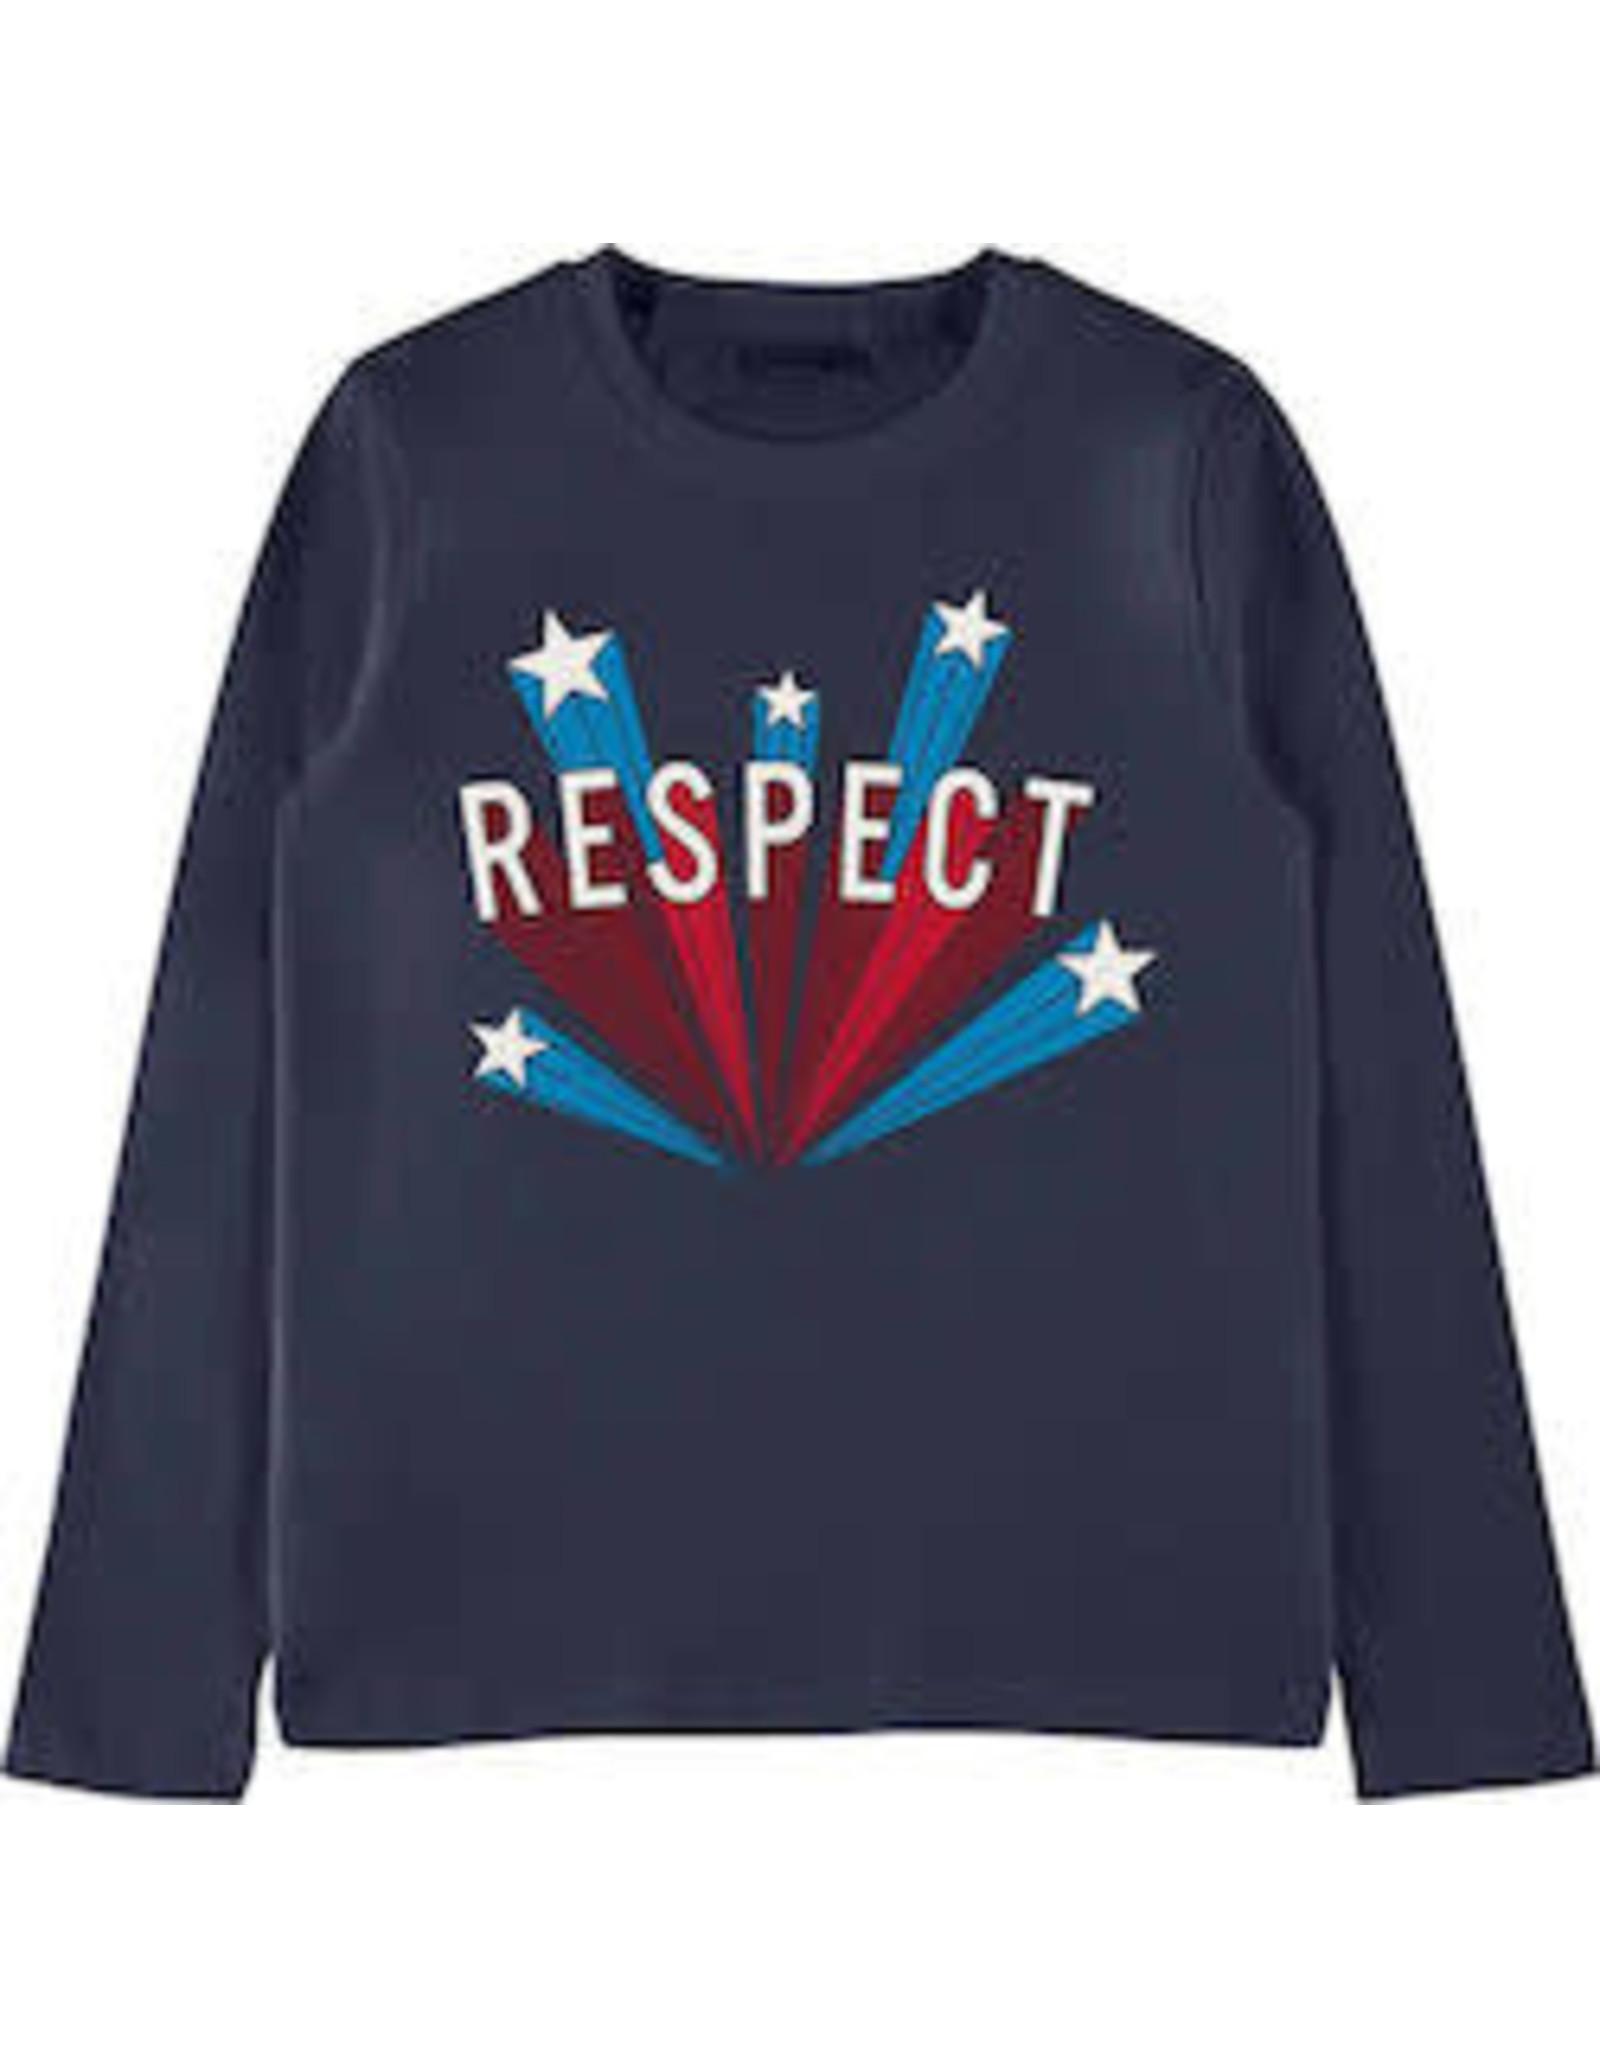 Name It Basis t-shirt donkerblauw met grafische print